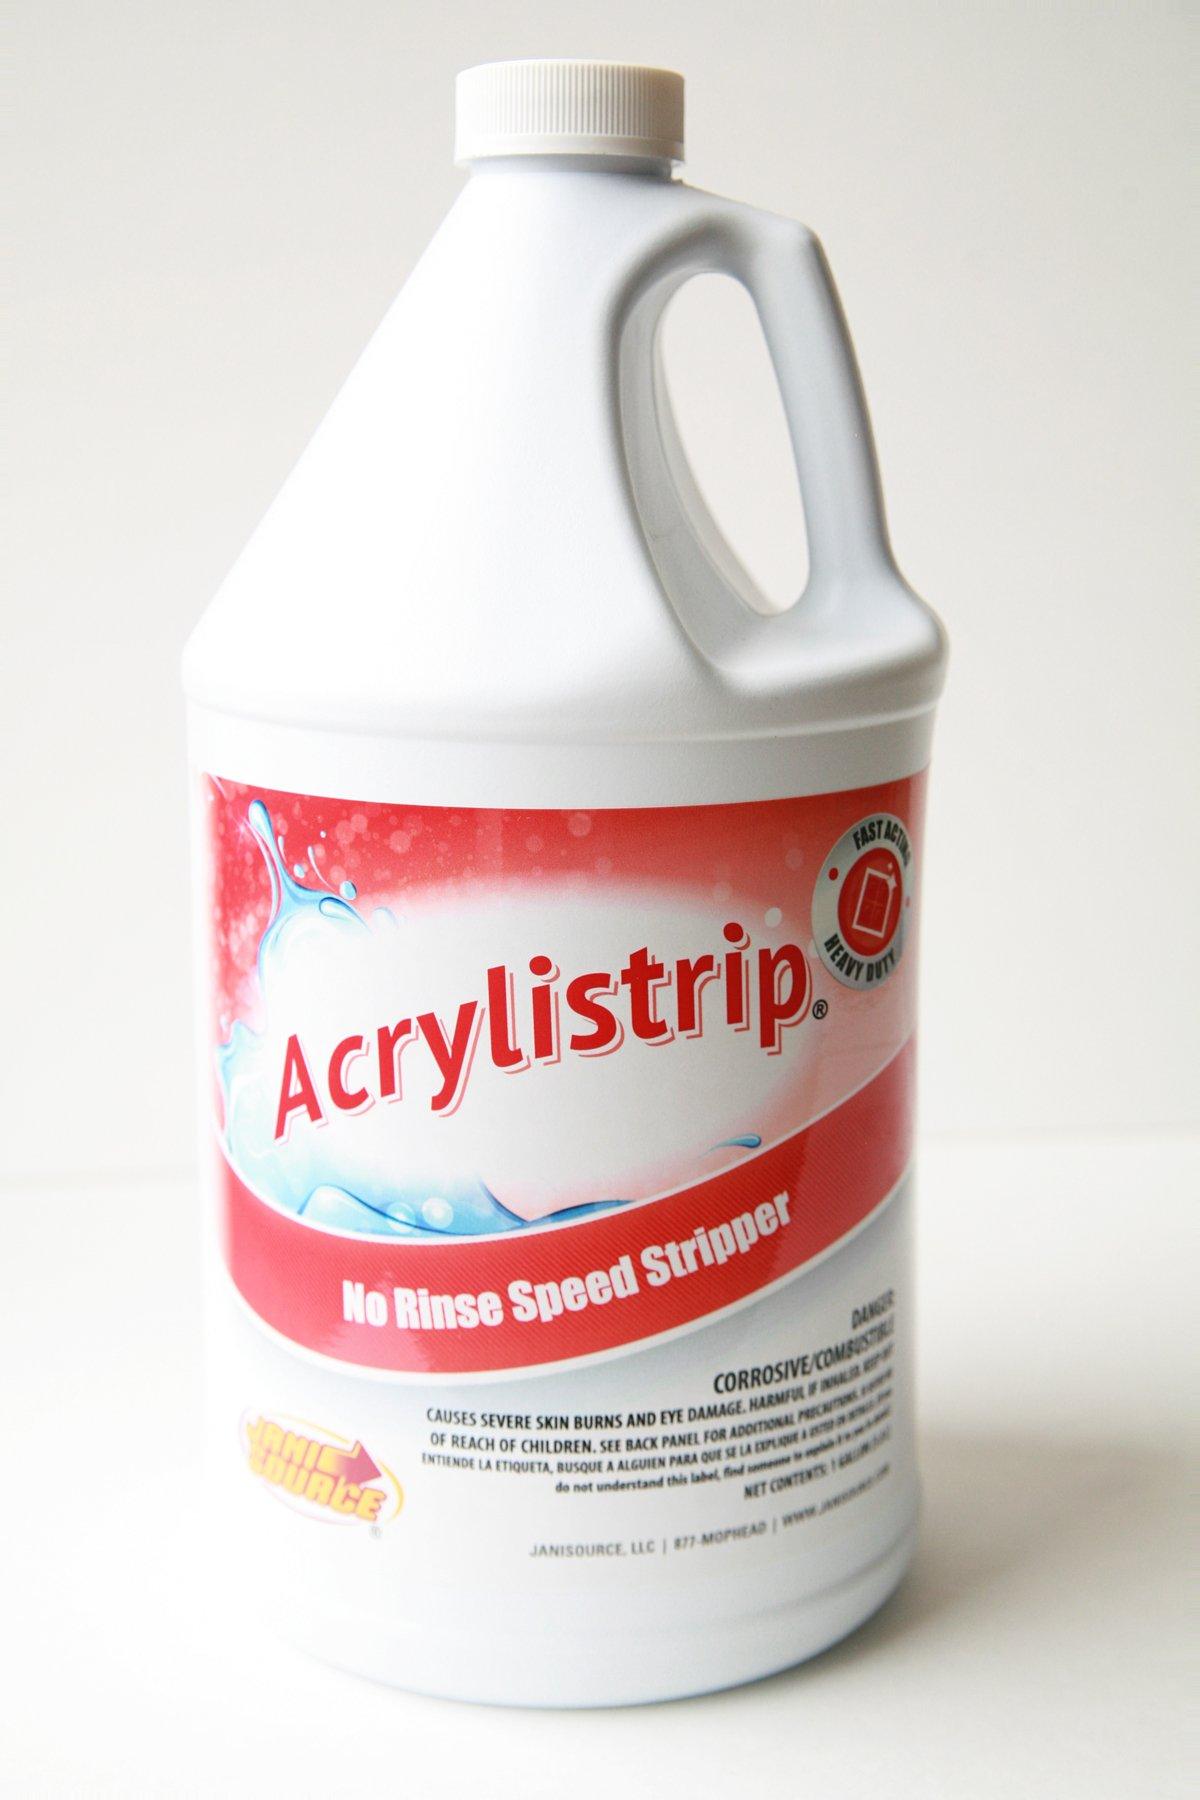 Acrylistrip Professional Floor Wax Stripper - 1 Gallon